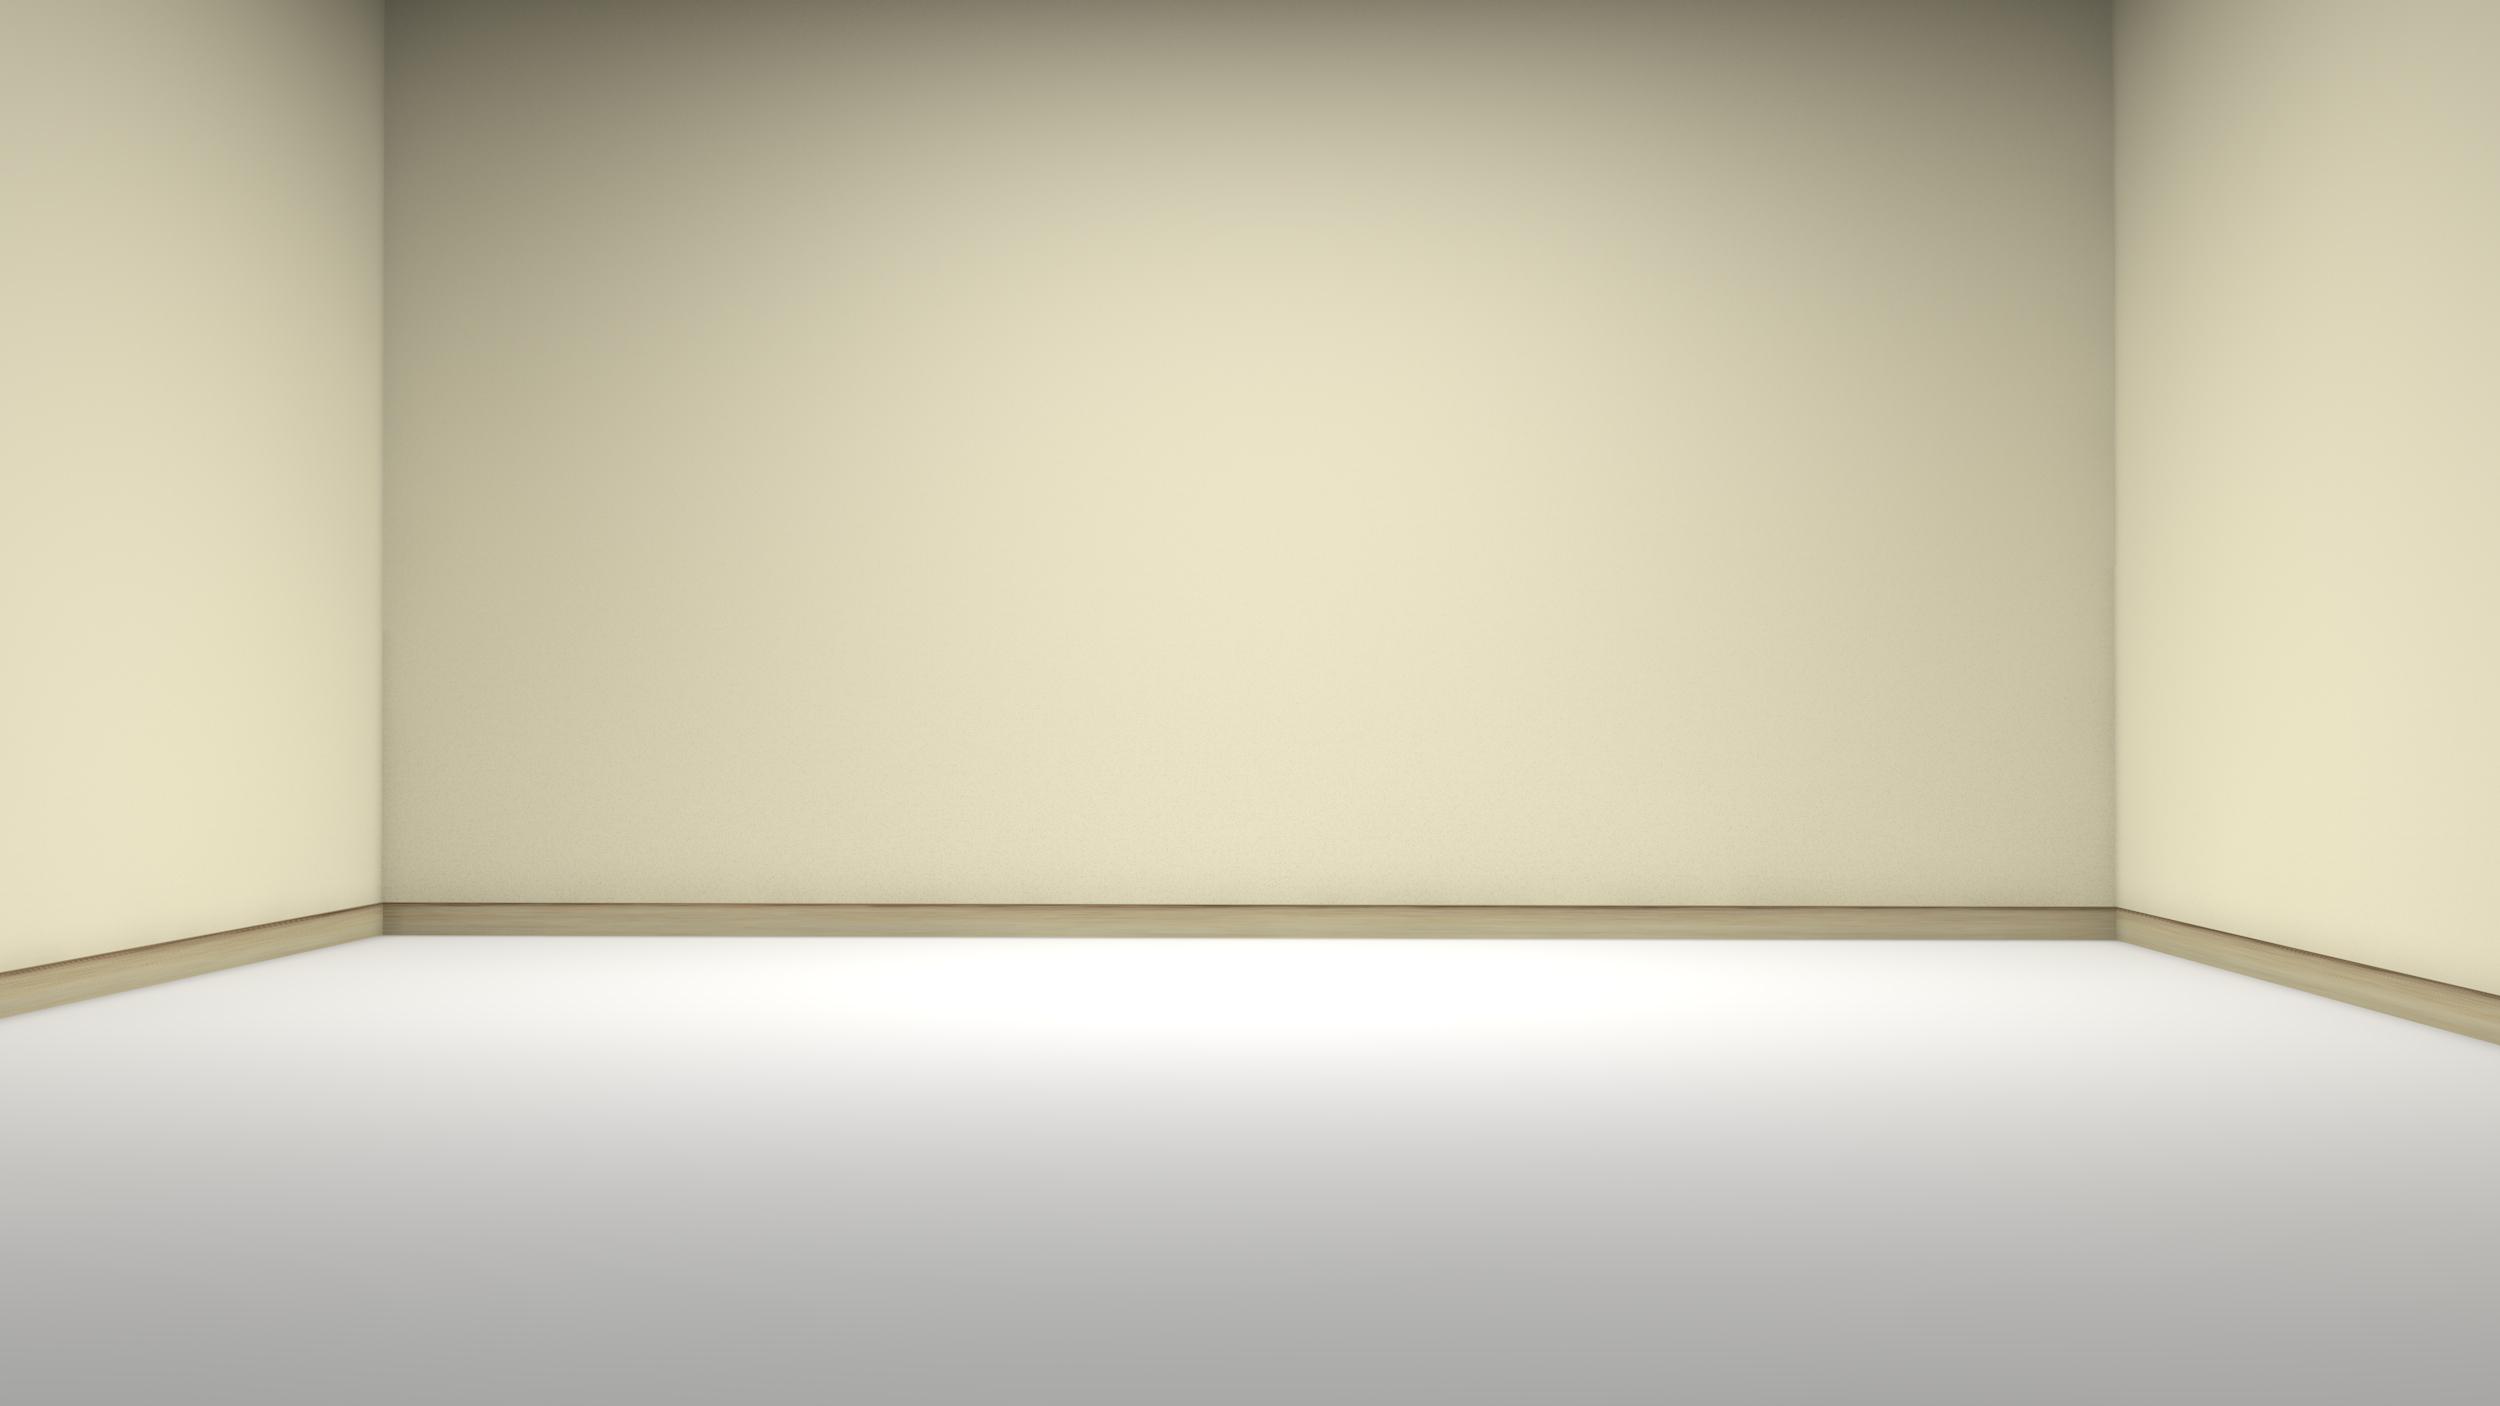 MMWR - Komodo upload 07 Empty-room by winampers-pro on